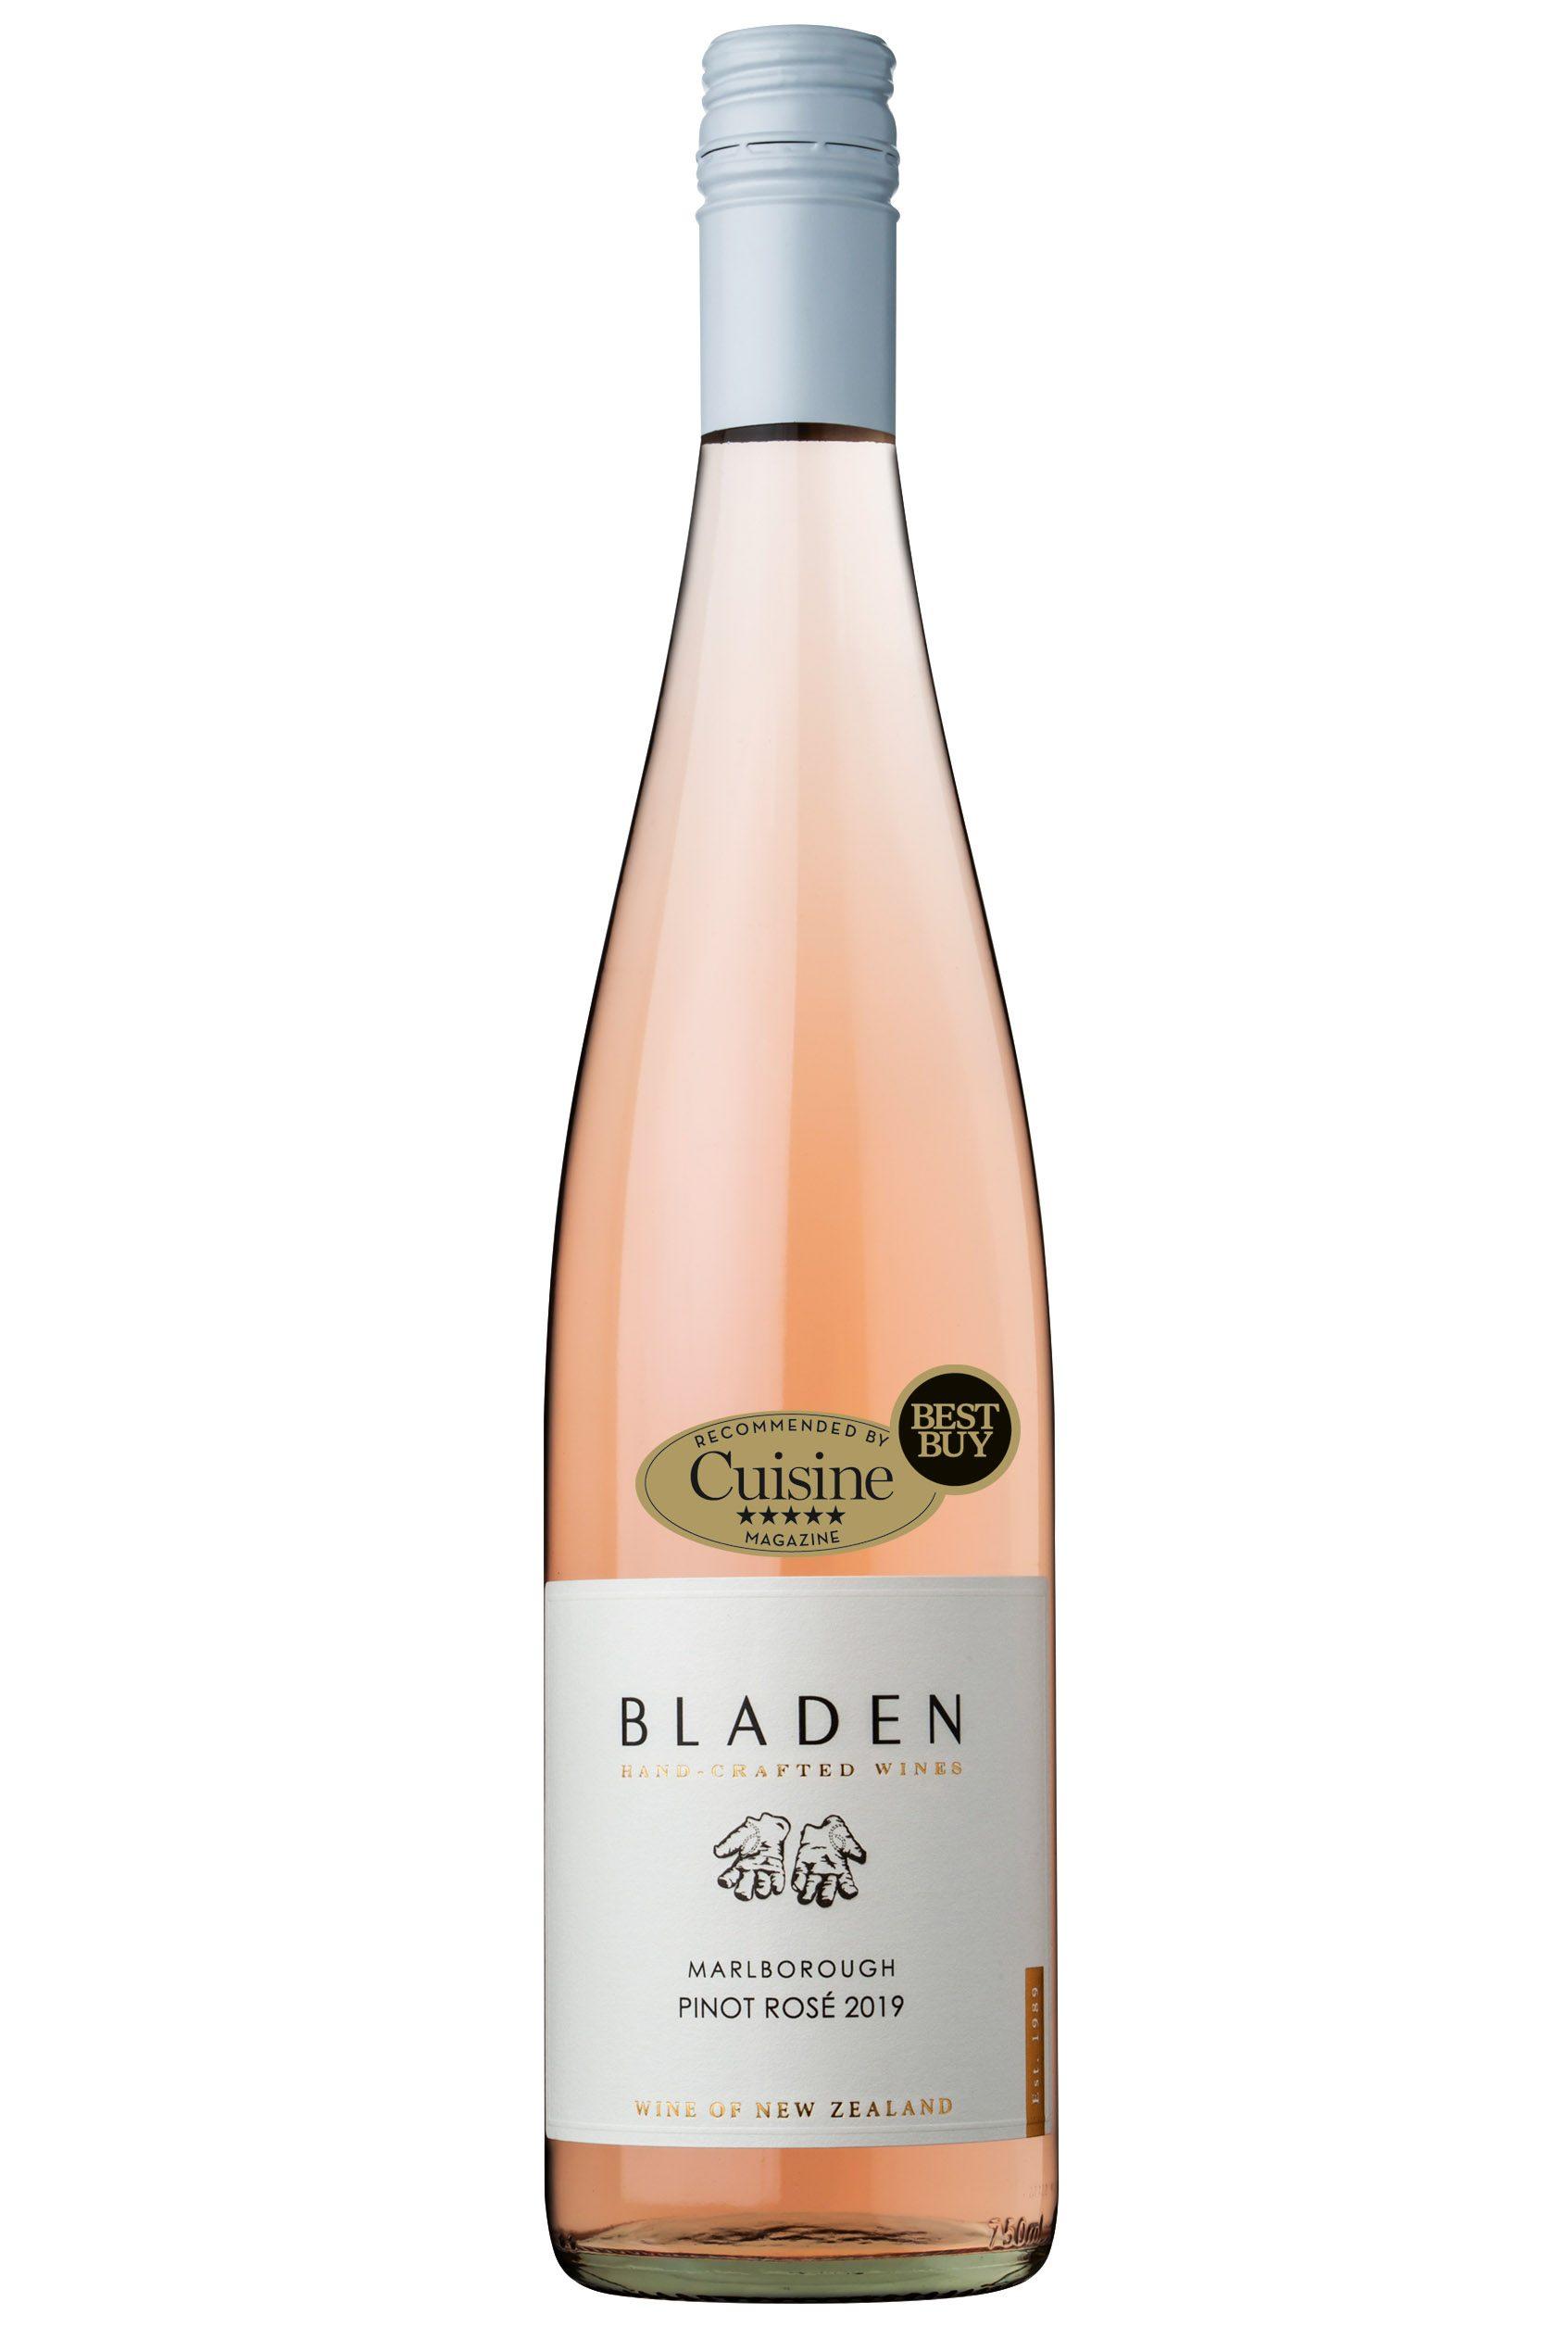 Bladen Marlborough Pinot Rosé 2019